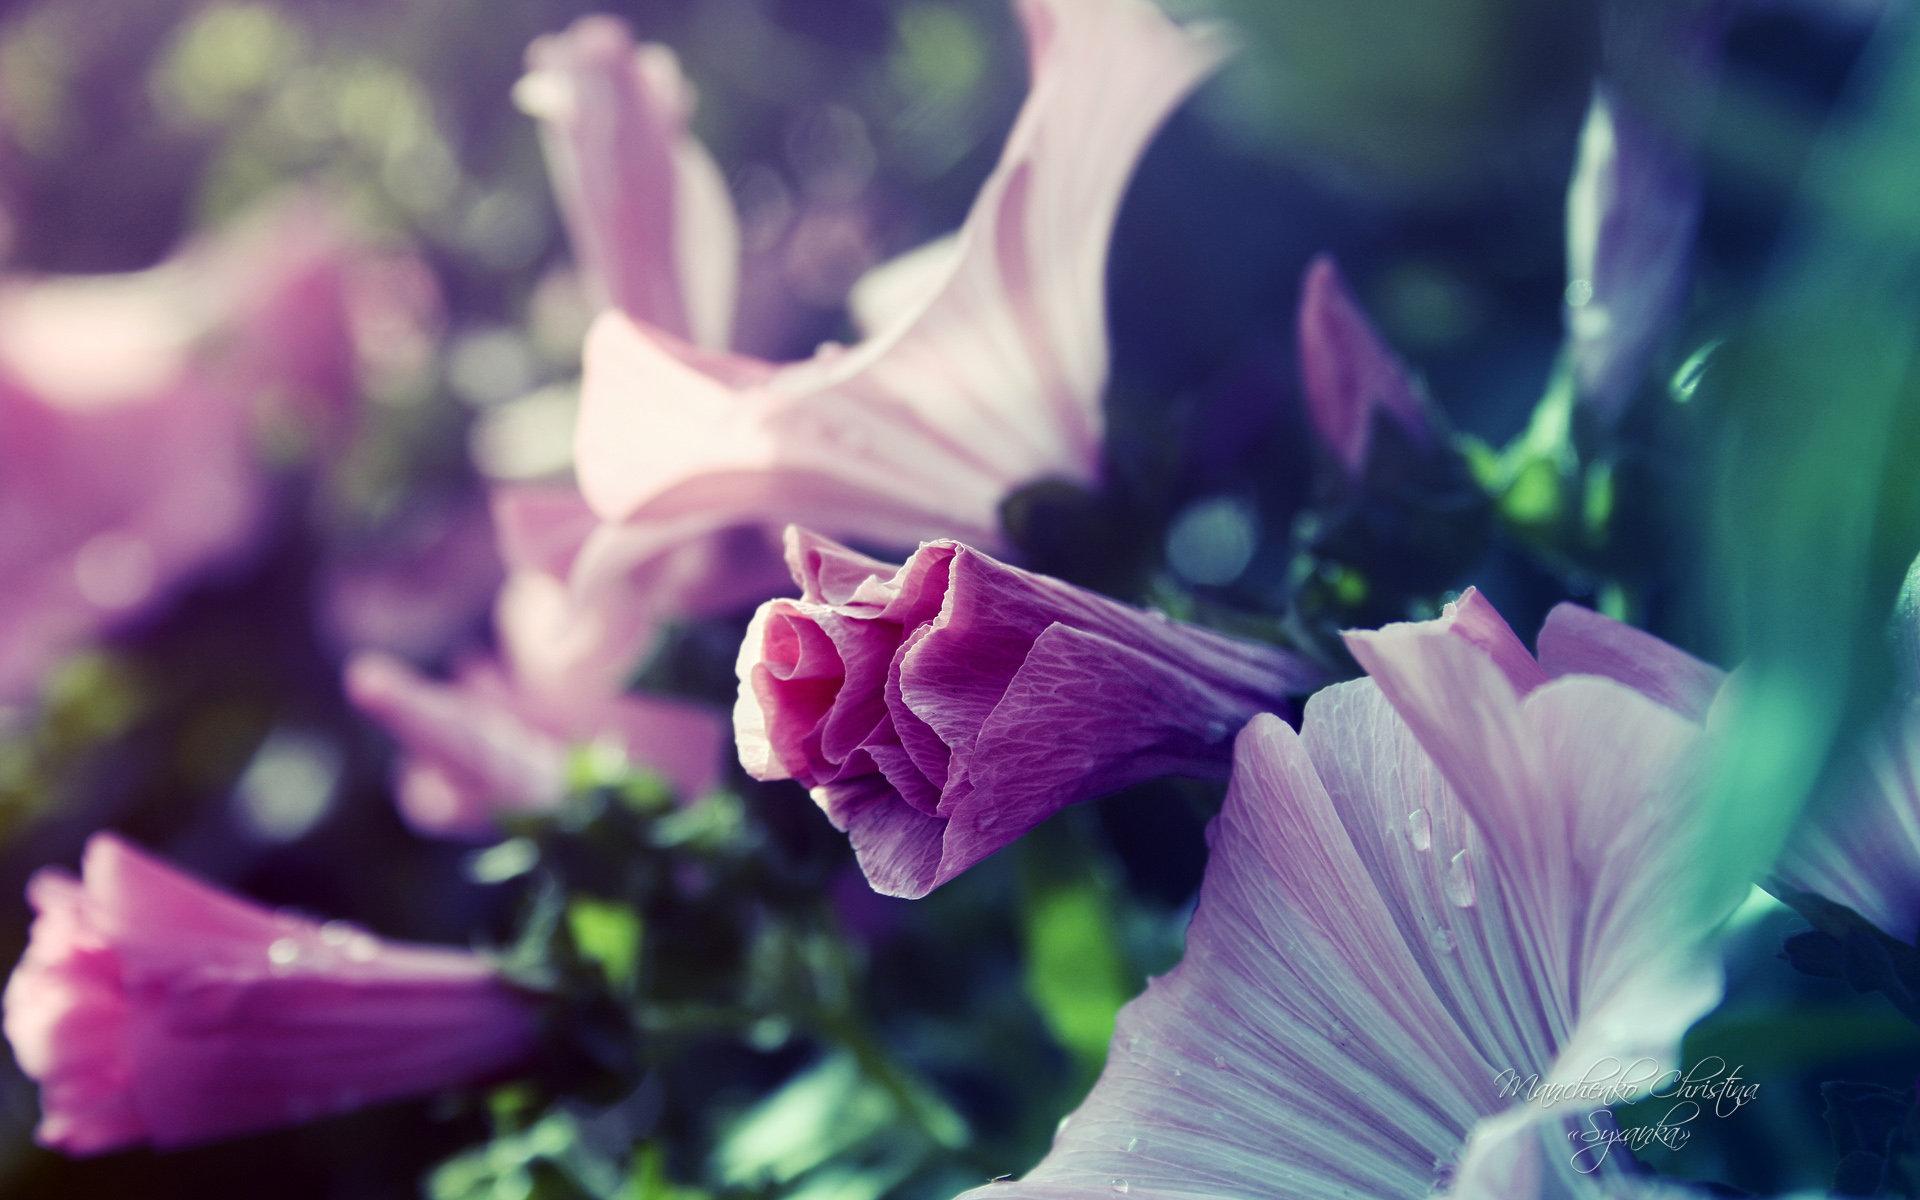 win8唯美梦幻花园植物唯美桌面壁纸图片